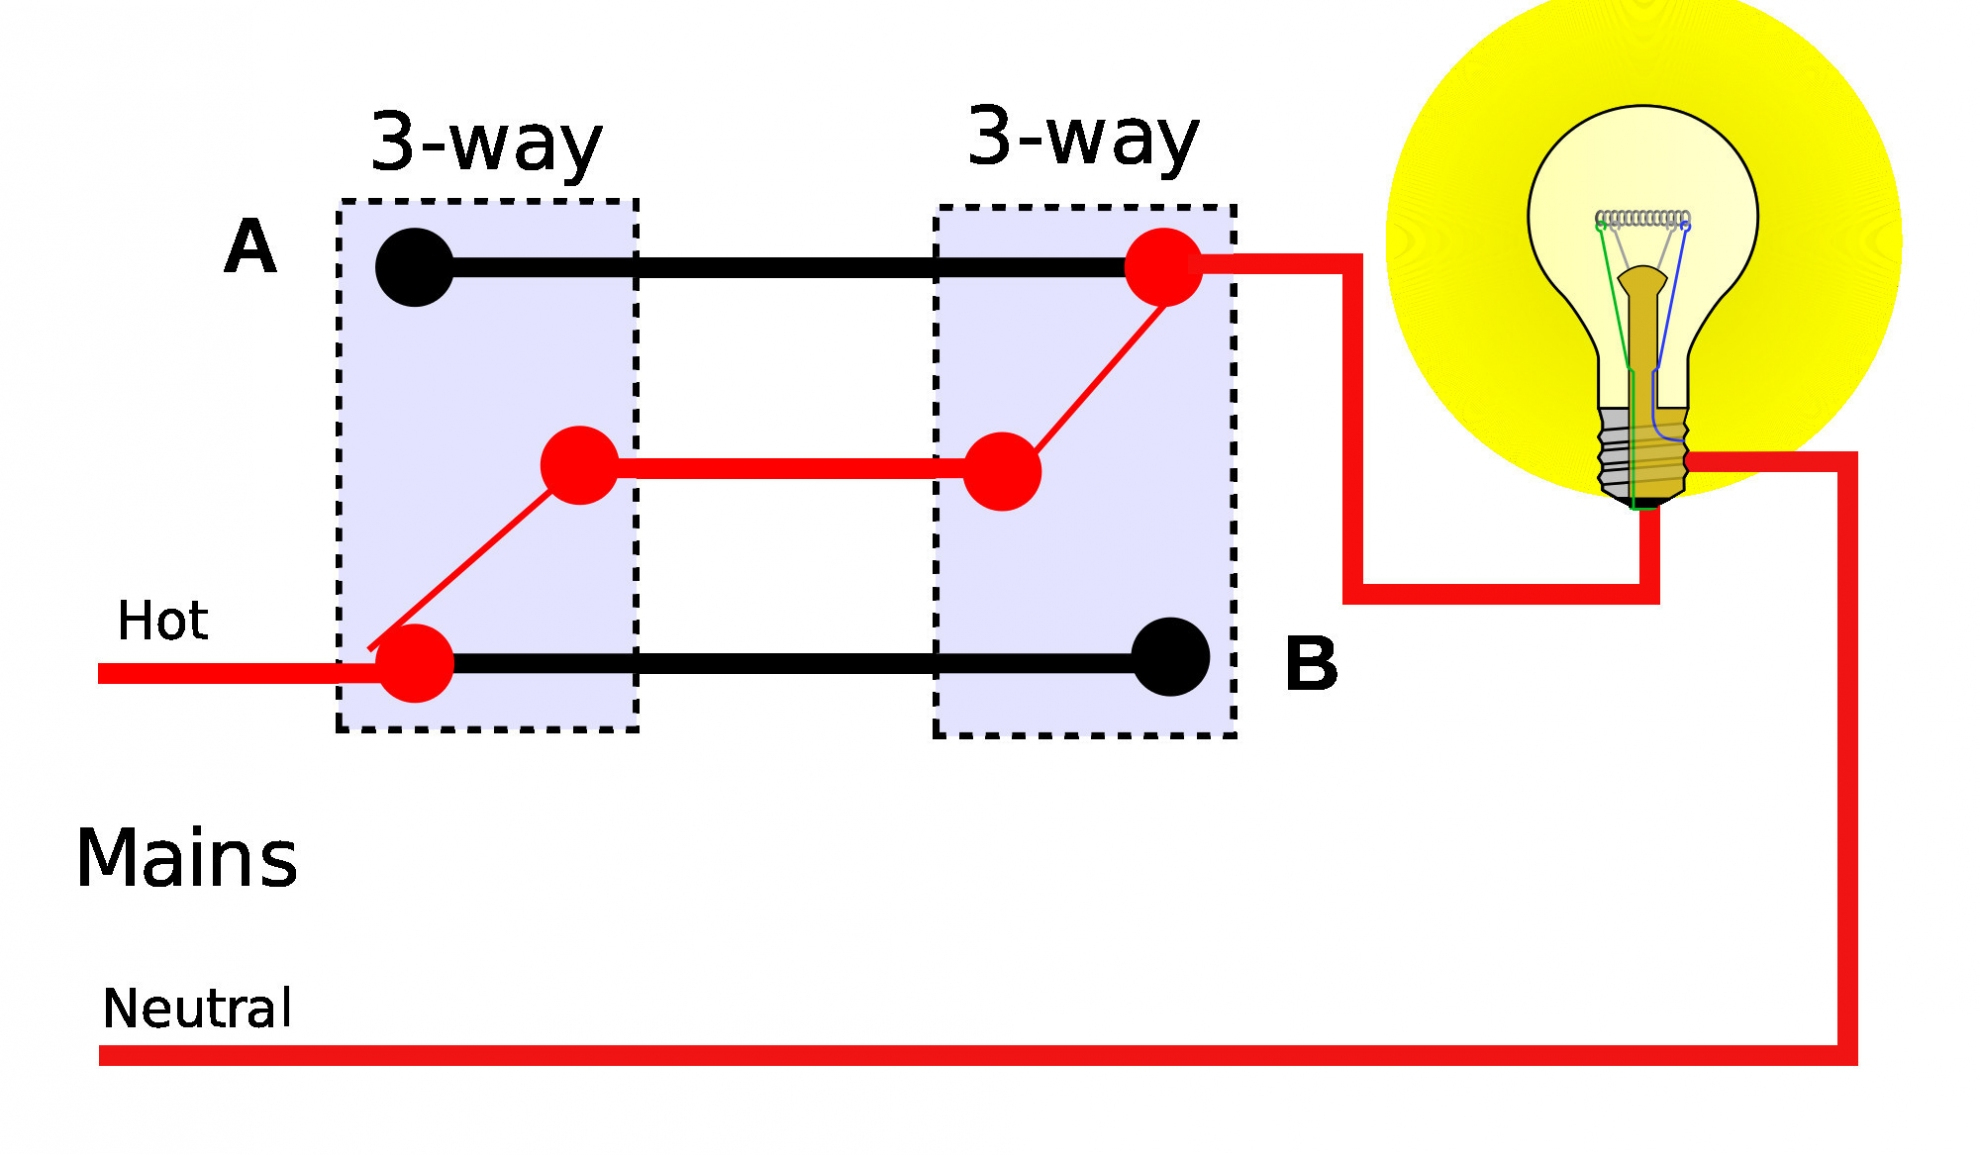 Two Way Switch Wiring Diagram – Wiring Diagram For 3 Way Switches - 4 Way Switch Wiring Diagram Multiple Lights